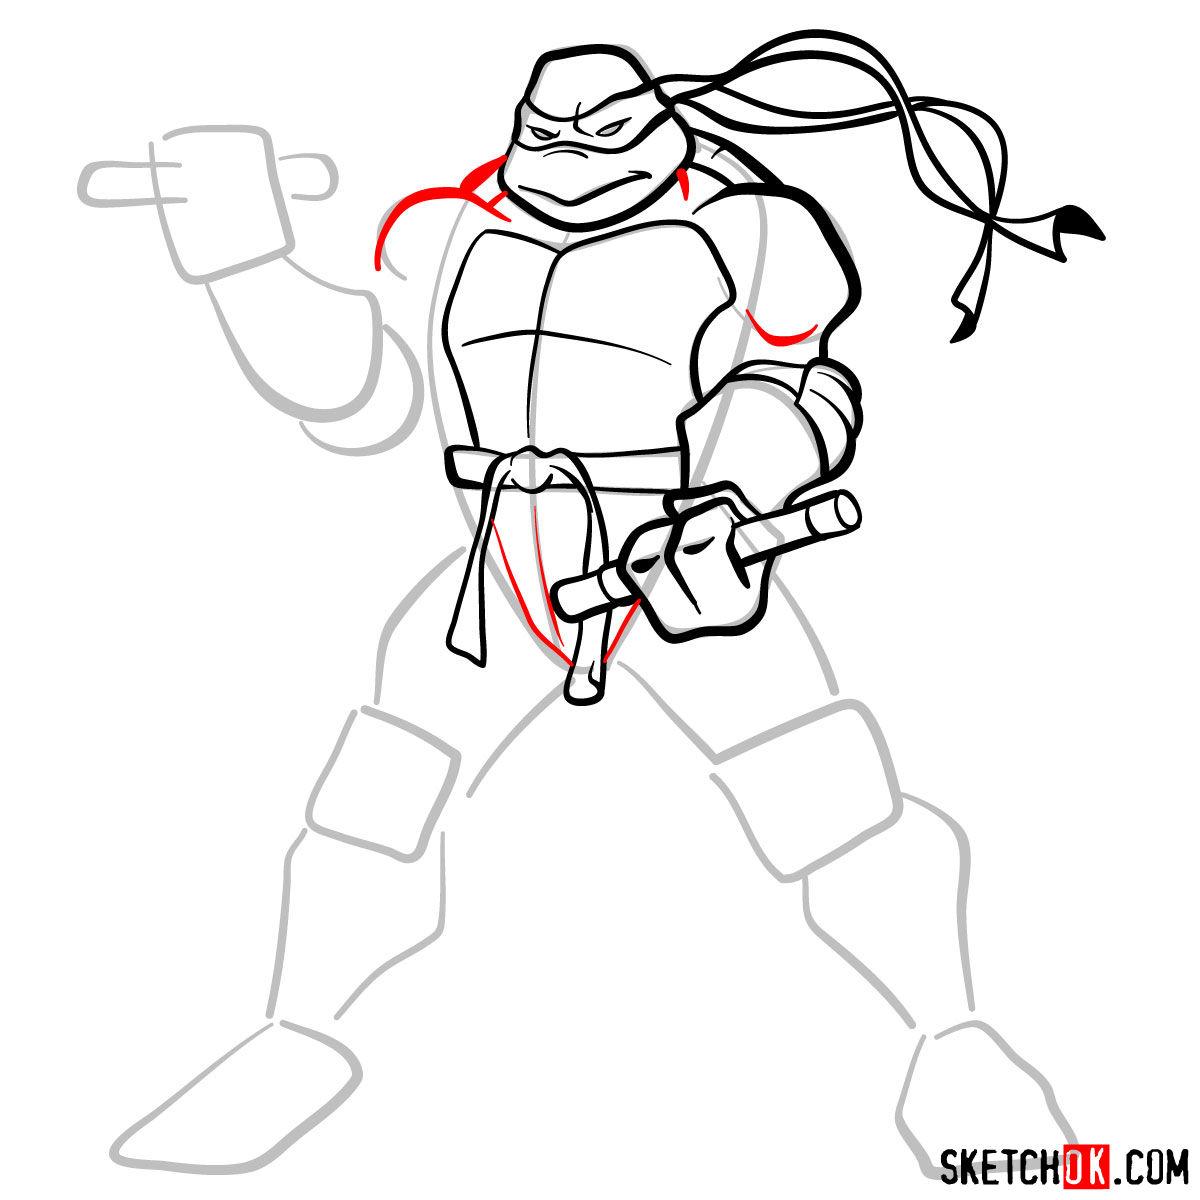 How to draw Michaelangelo ninja turtle - step 08